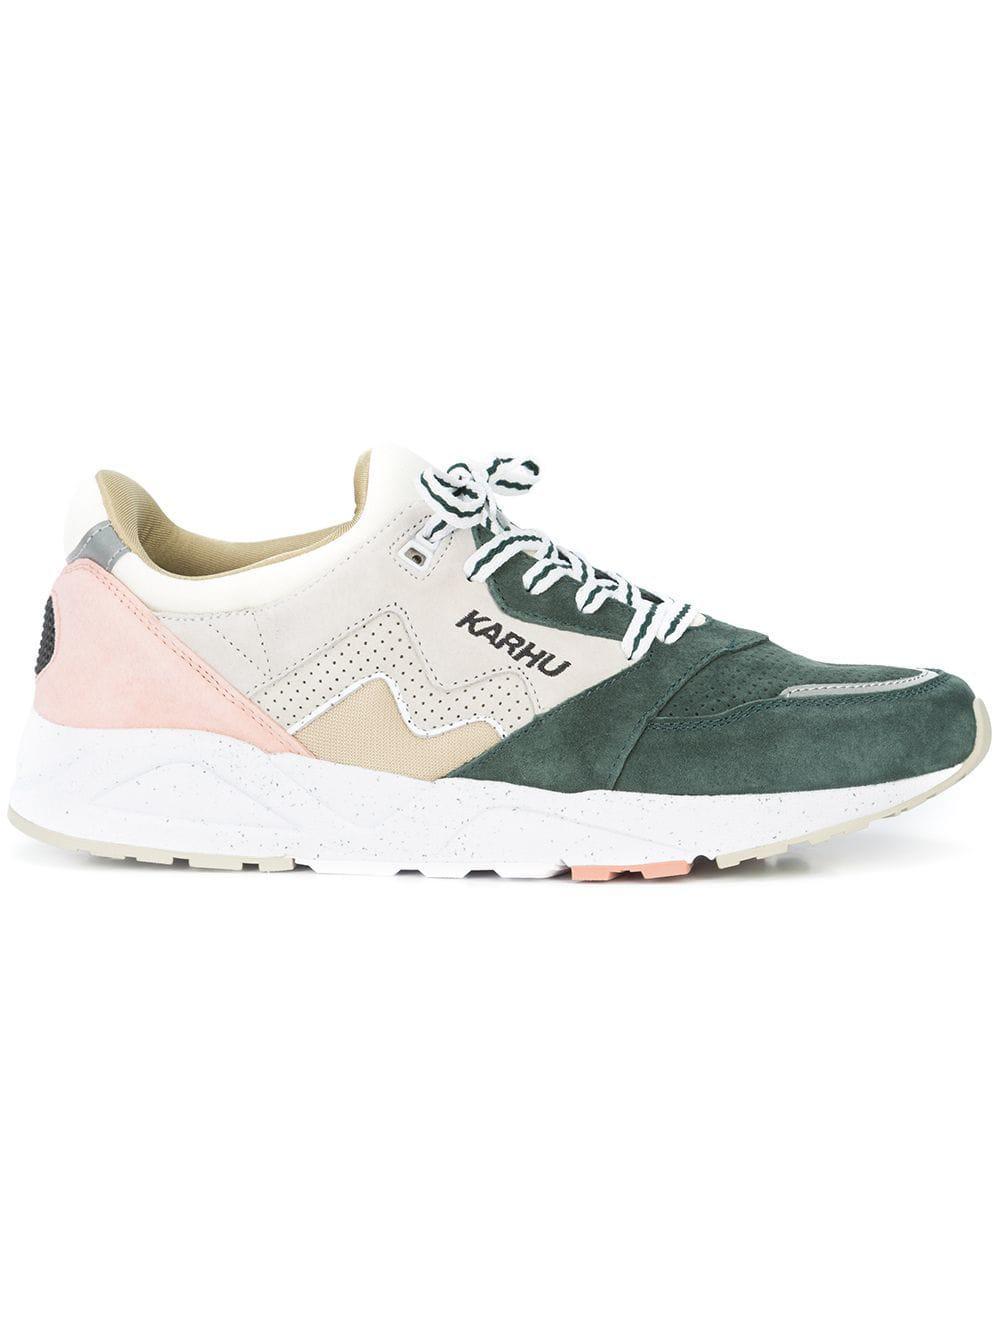 3971e4a040d Karhu Aria Sneakers - Lyst